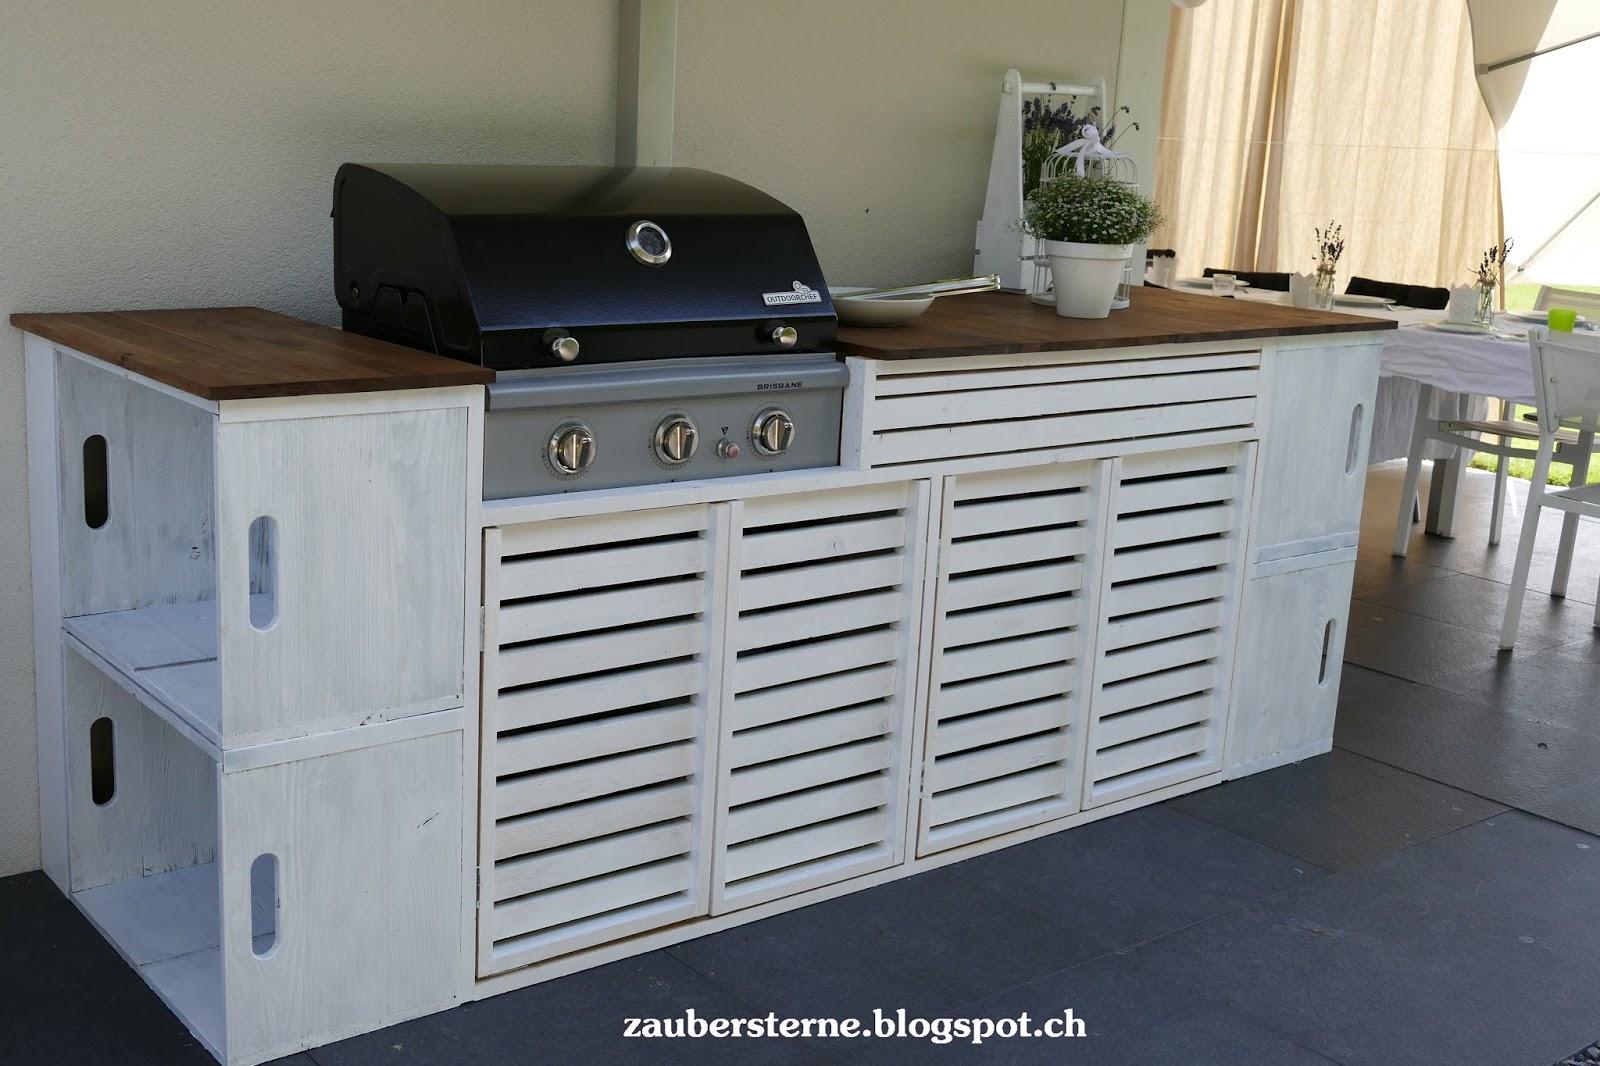 Outdoor Küche Ikea Usa : Outdoor küche bauen ikea outdoor küche selber bauen stein küche